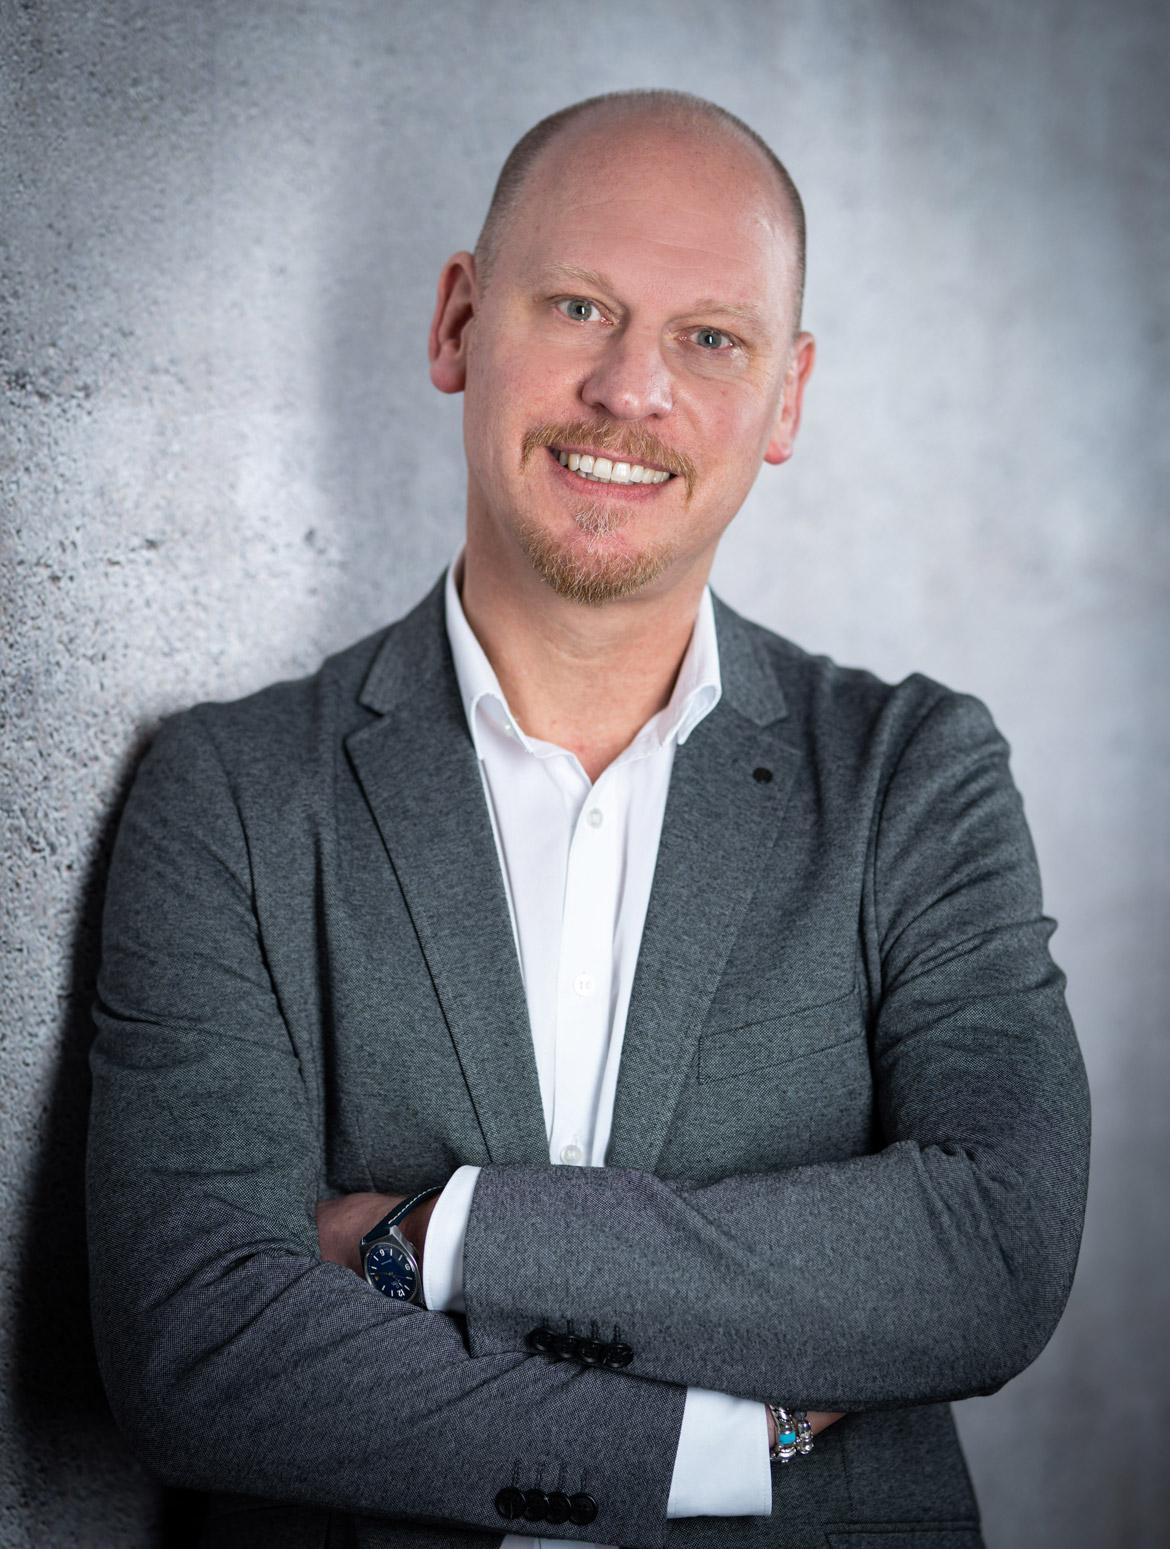 OHRpheus Inhaber Frank Igers Portraitbild